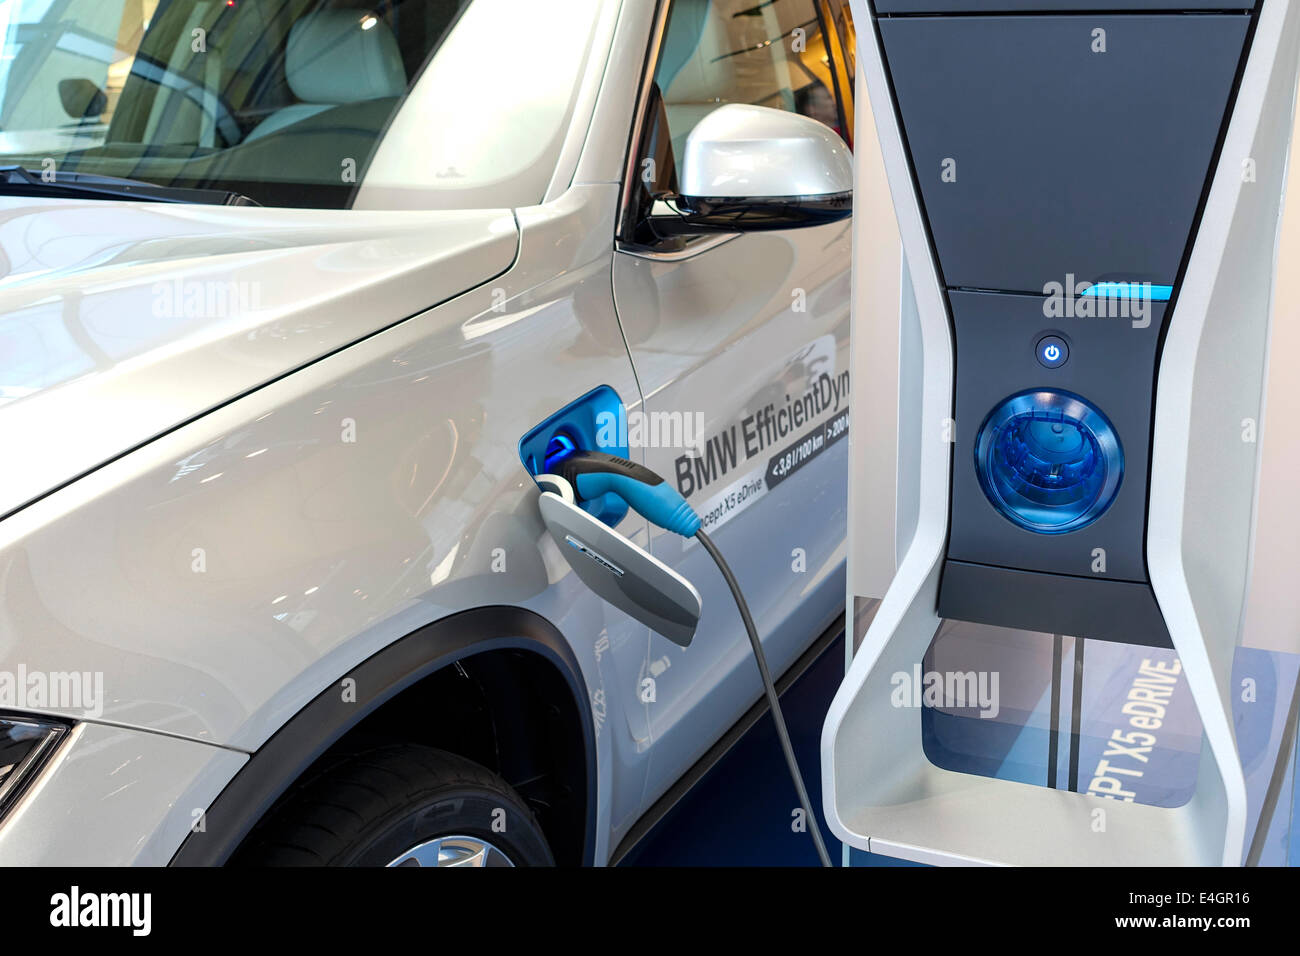 BMW X5 Concept eDrive, Sports Activity Vehicle (SAV) - Stock Image